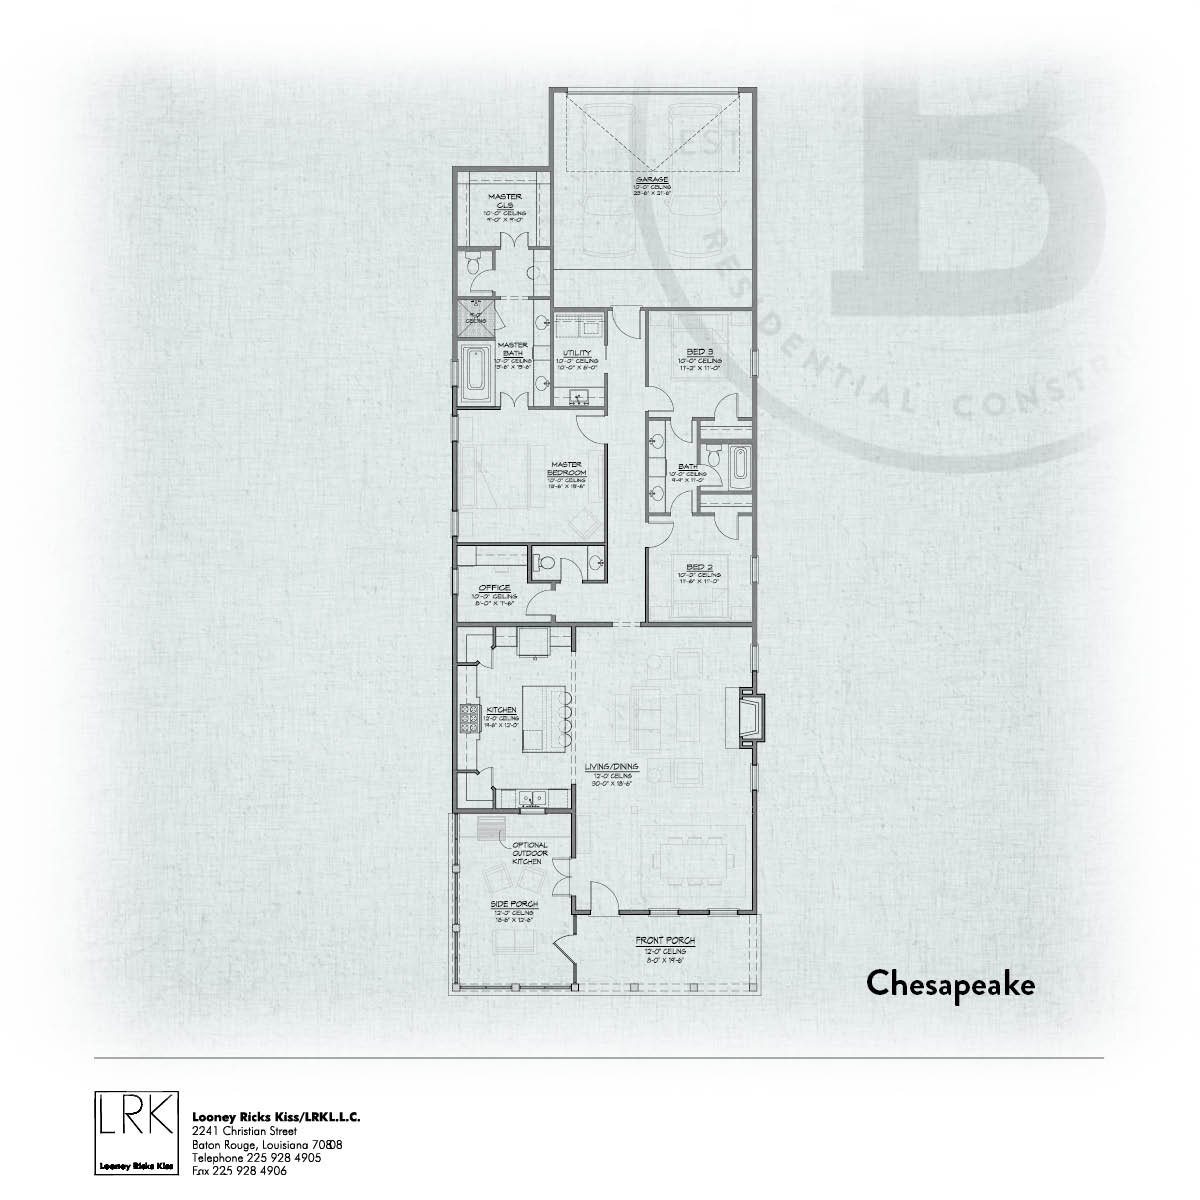 Chesapeake Floorplan